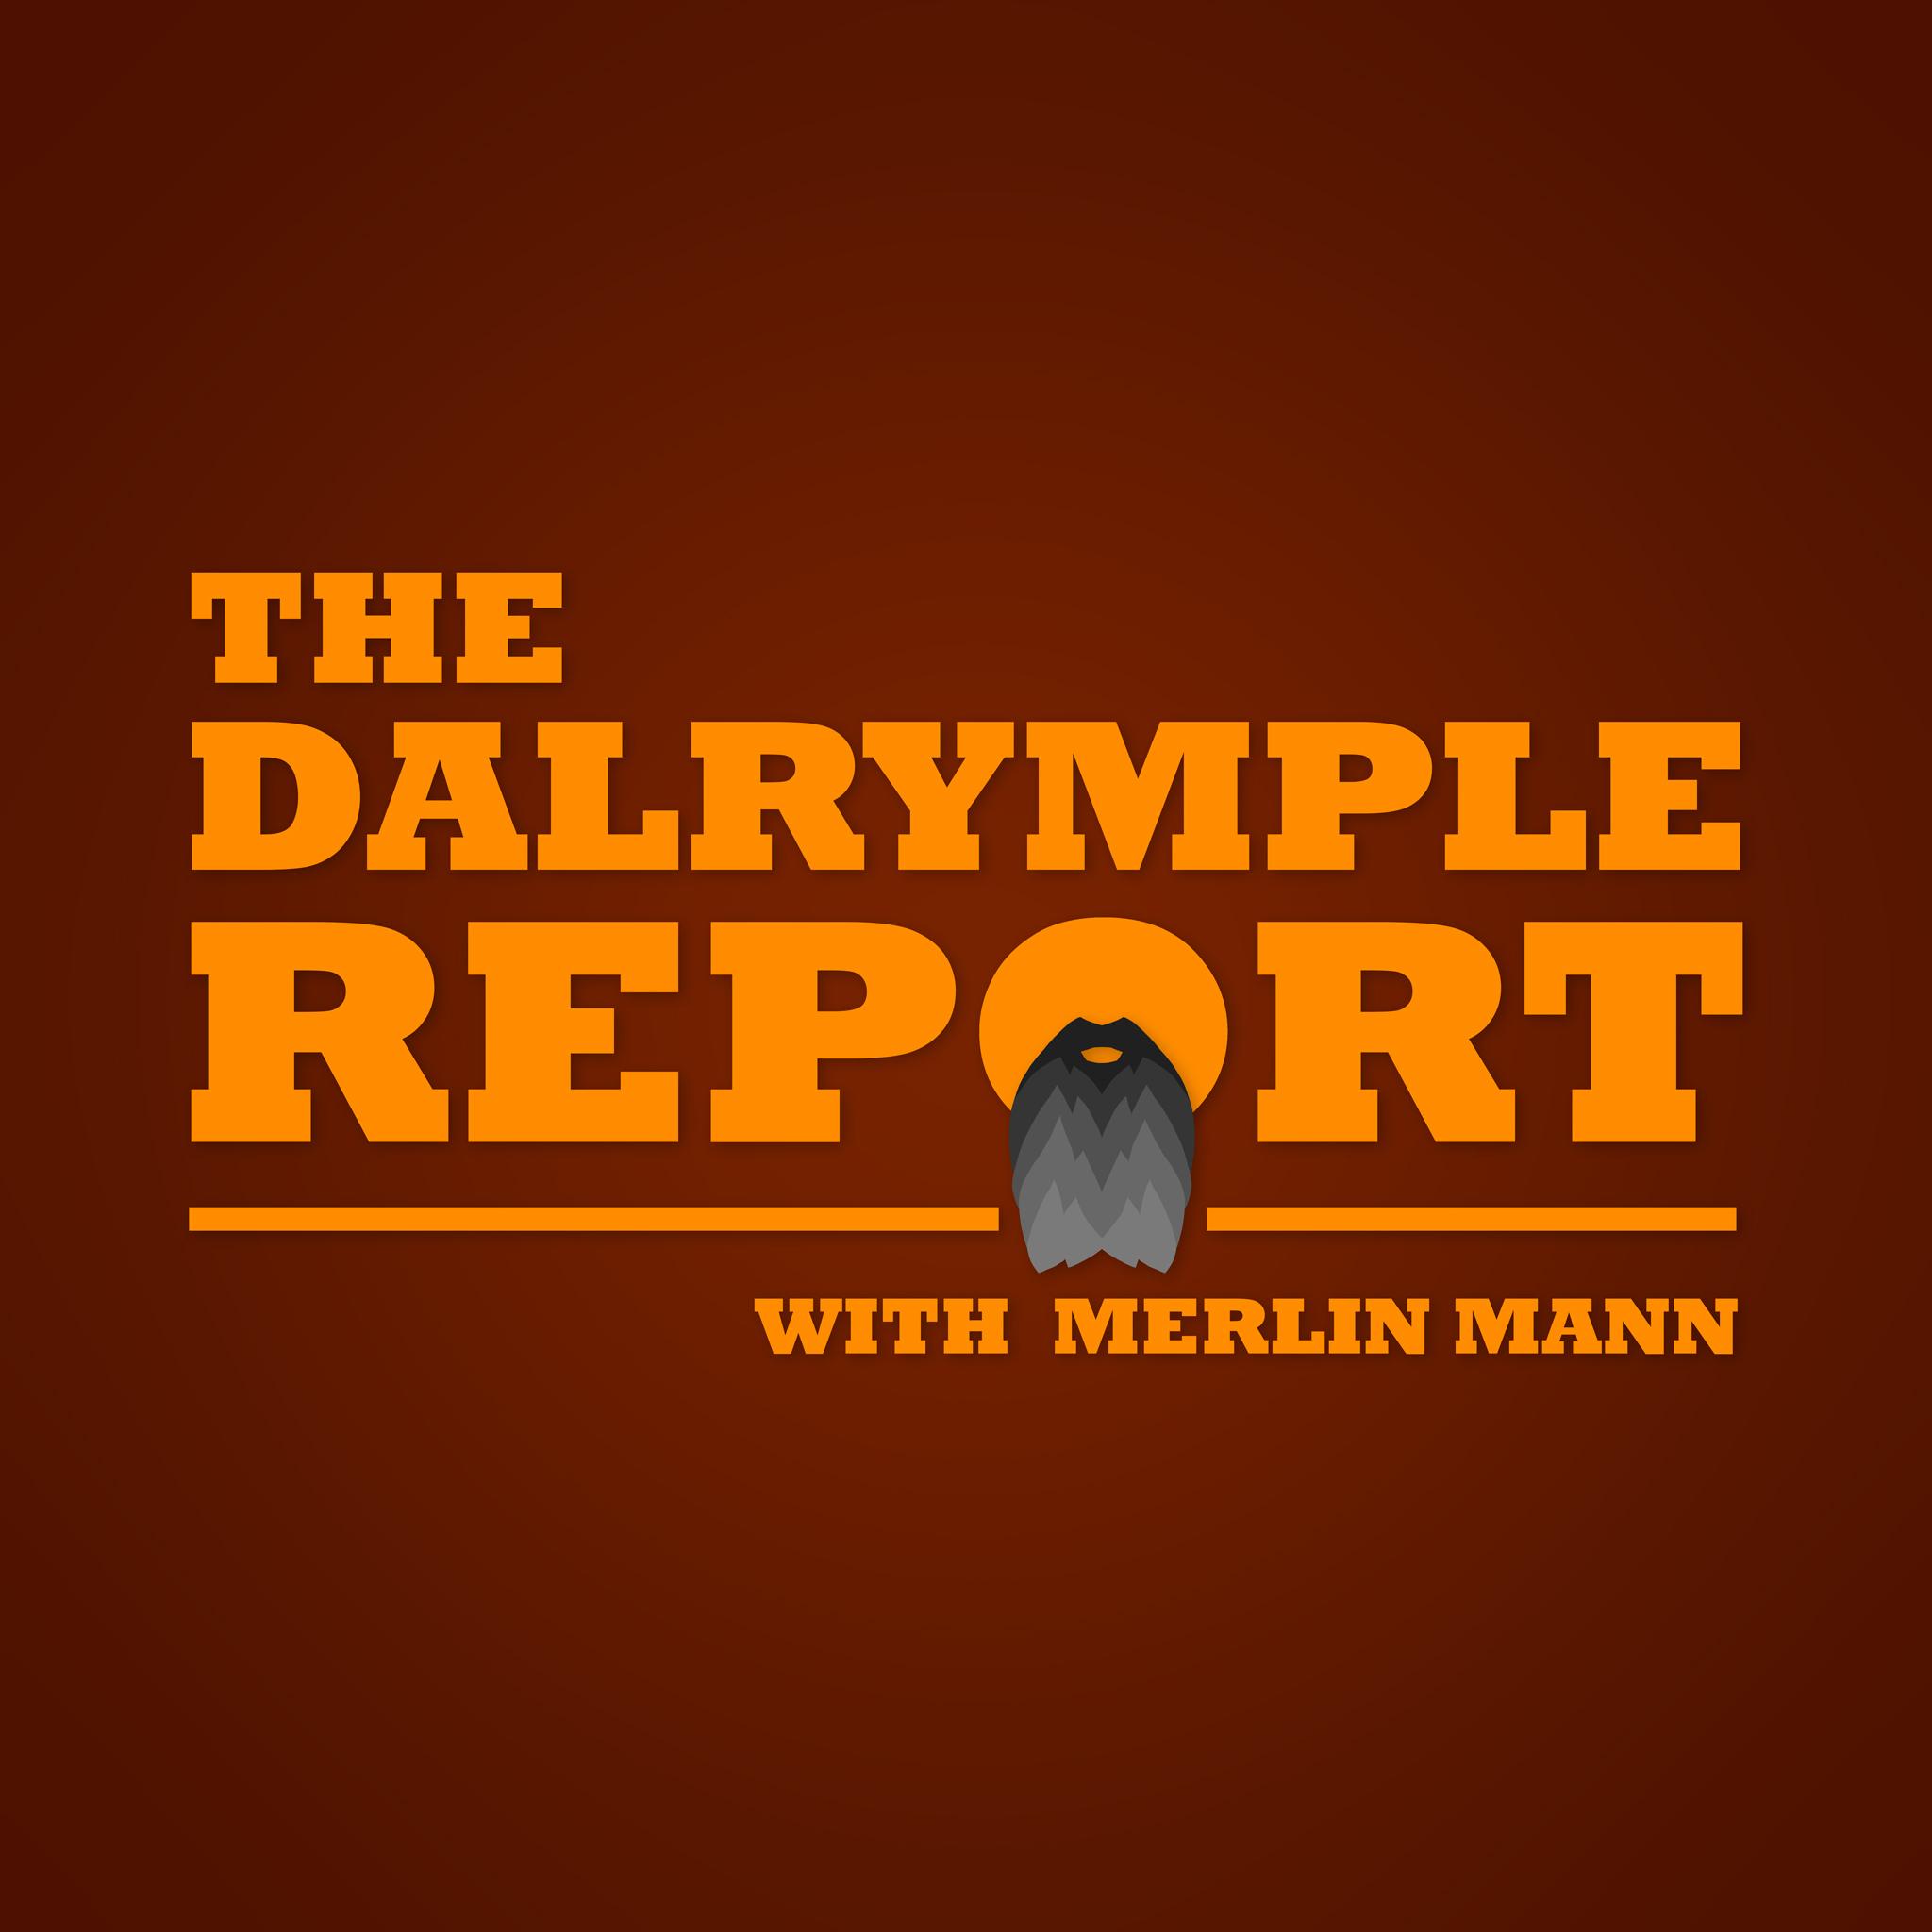 The Dalrymple Report